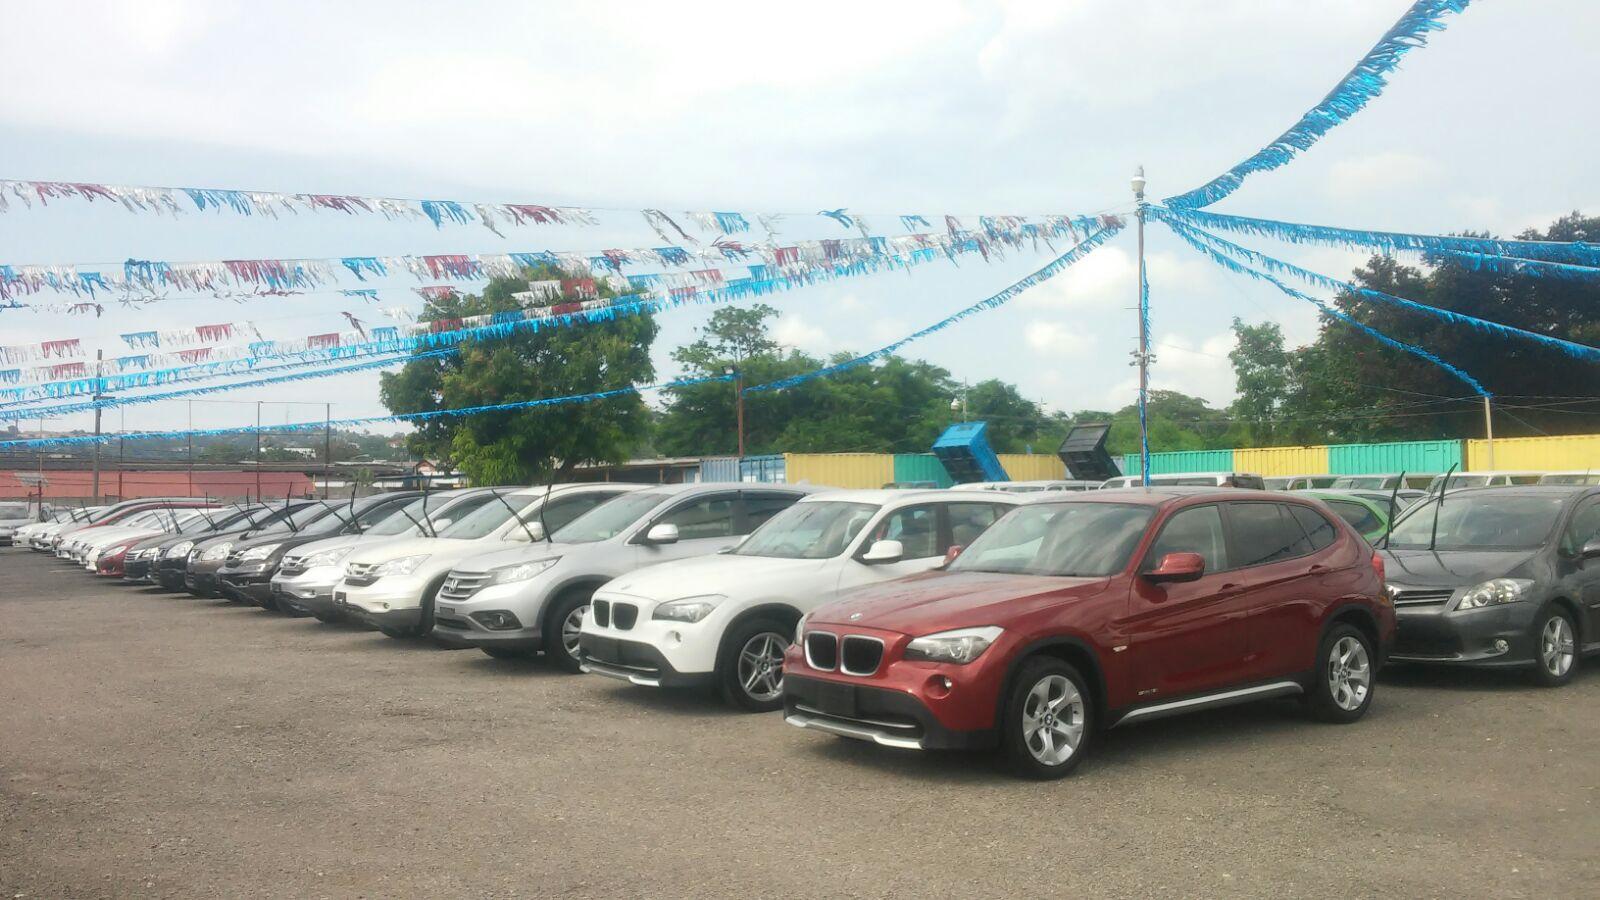 Prospective Motors Cars To Cars Auto Jamaica Used Car